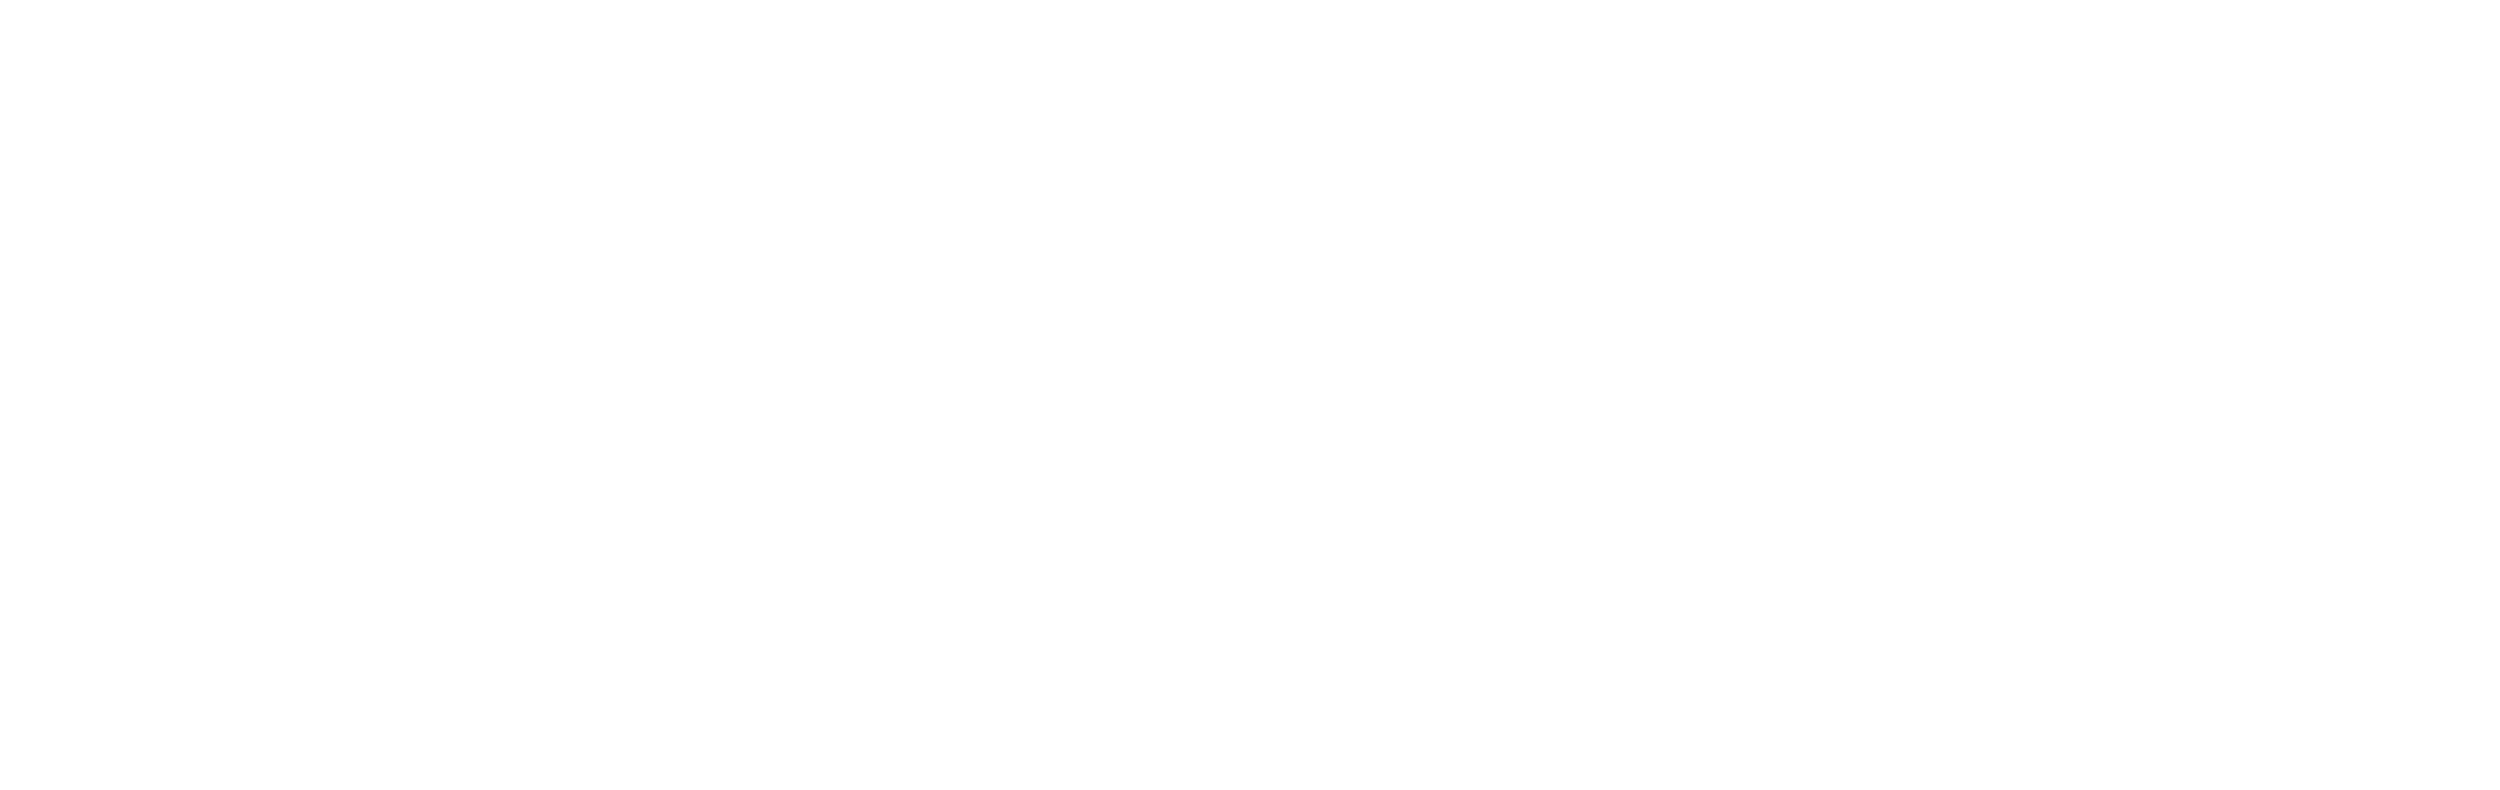 shout-logo.png